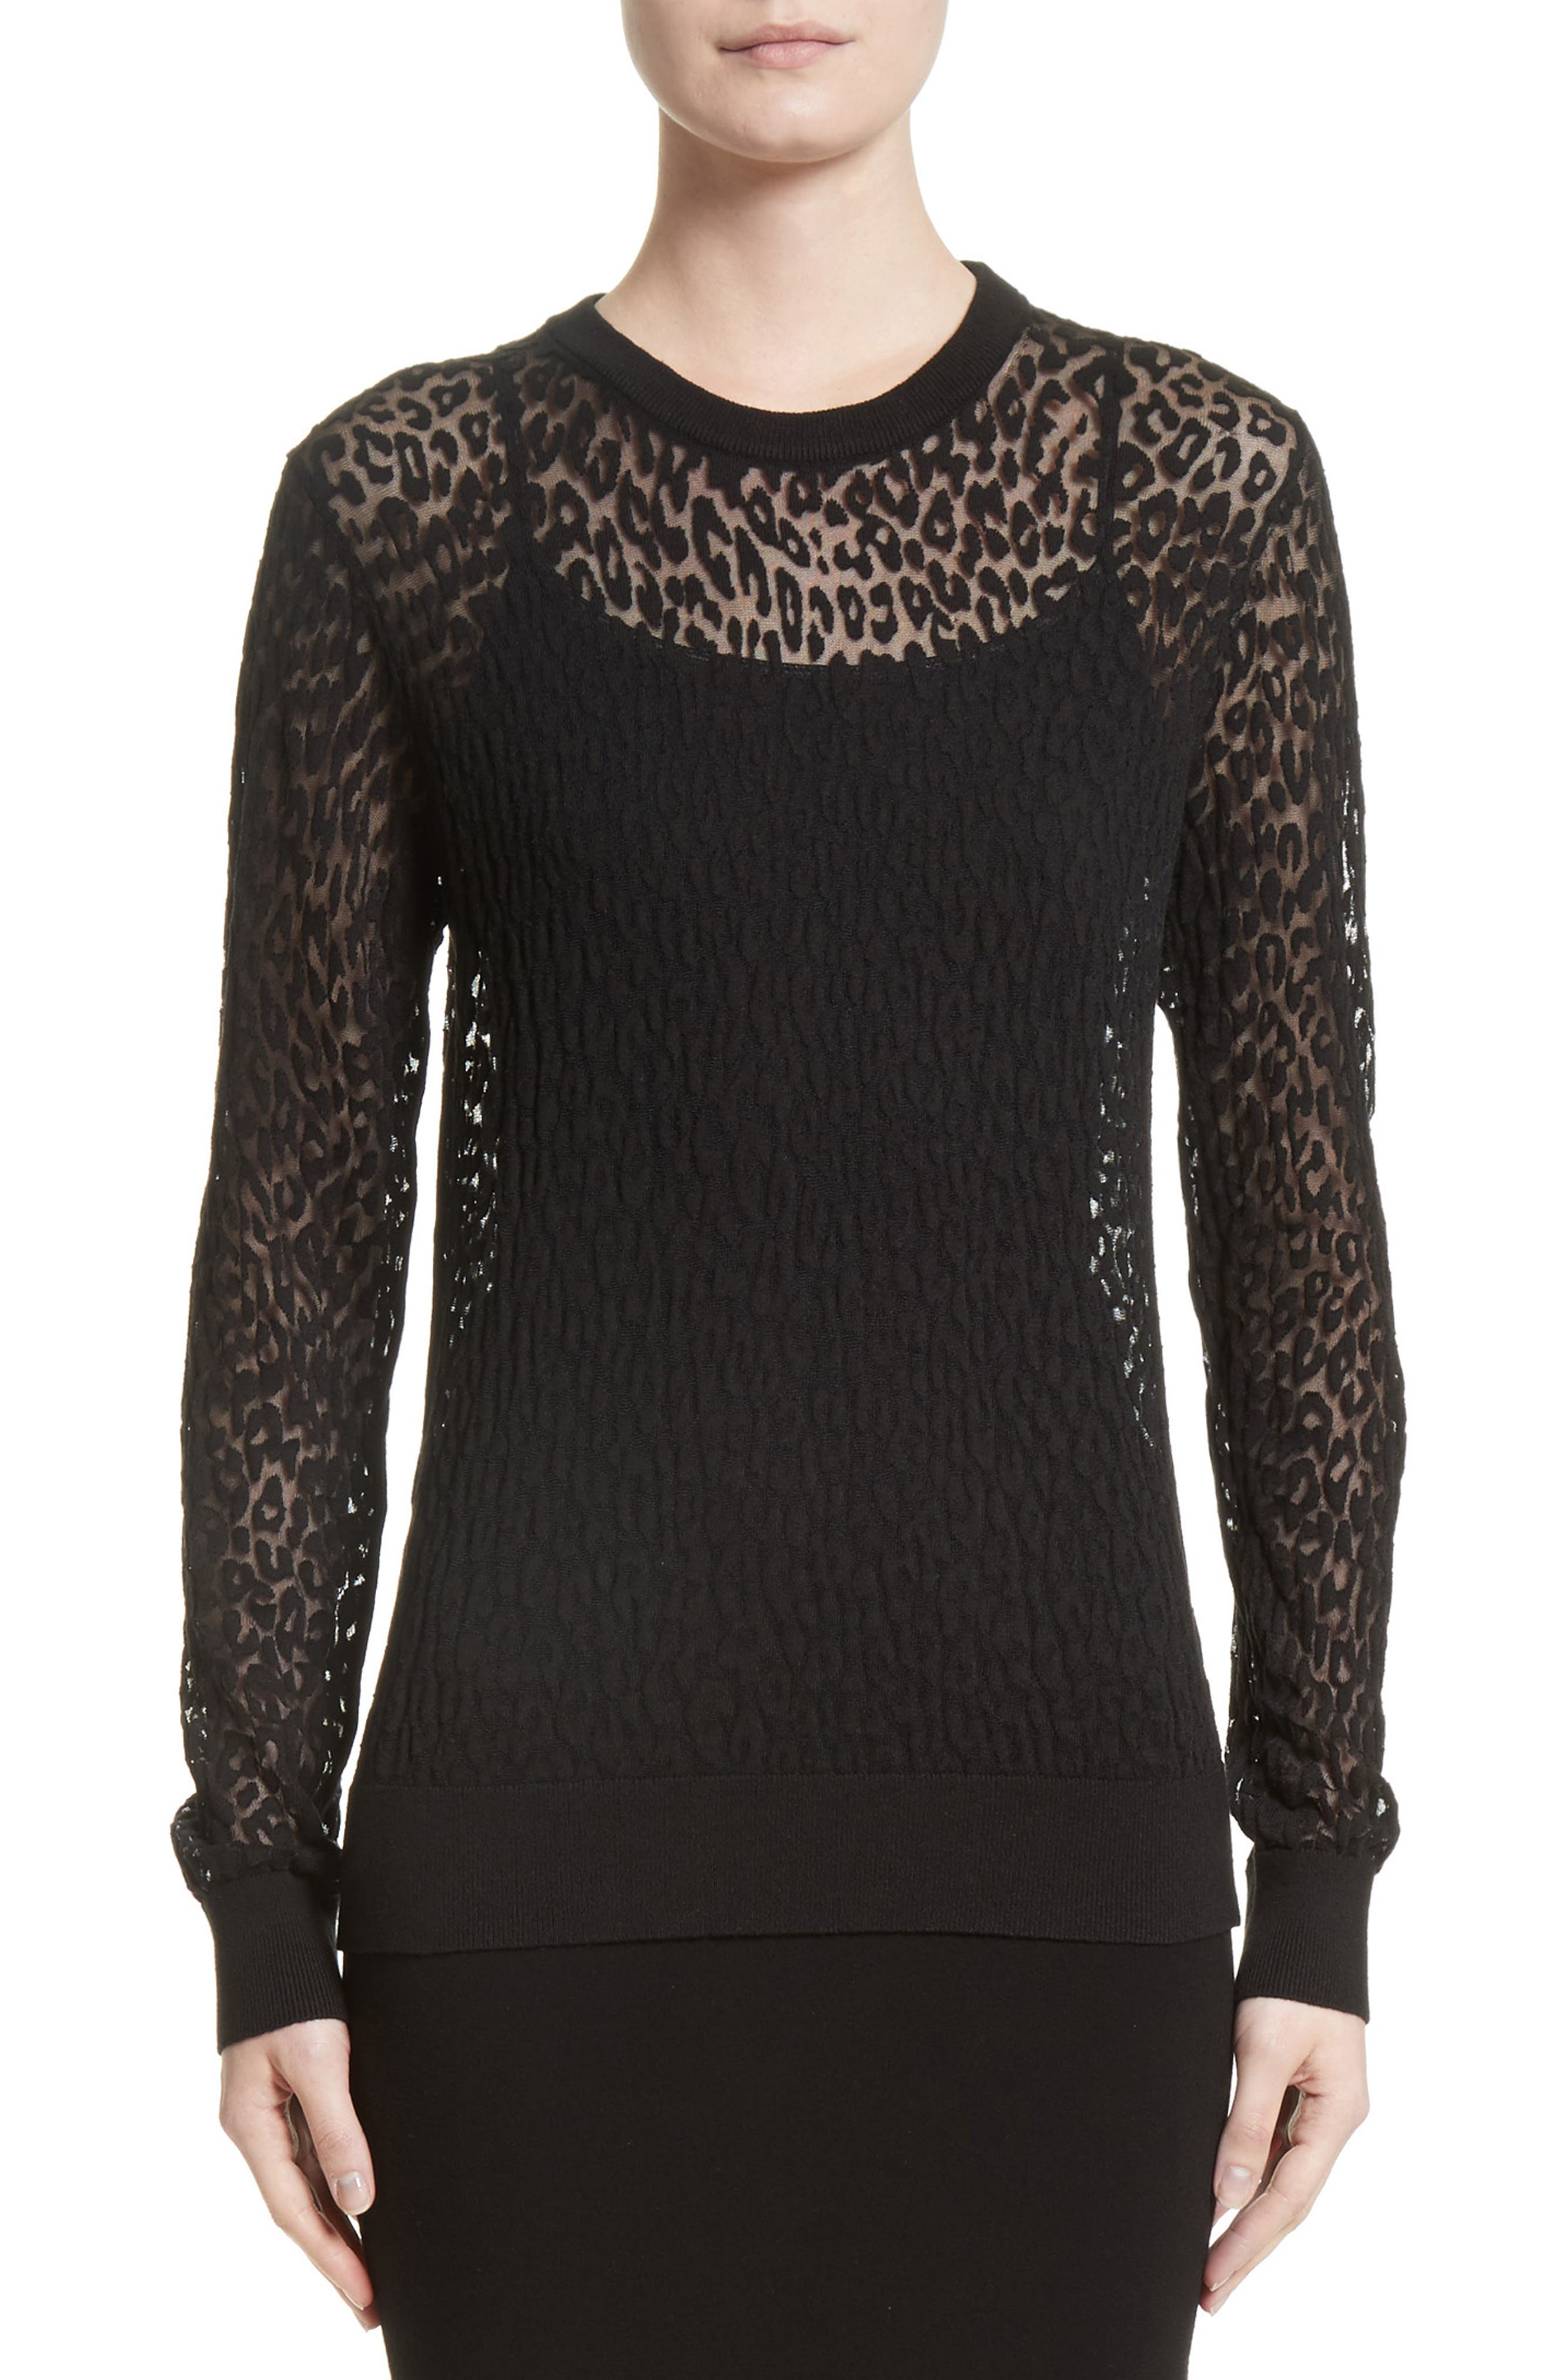 Alternate Image 1 Selected - Michael Kors Burnout Leopard Sweater